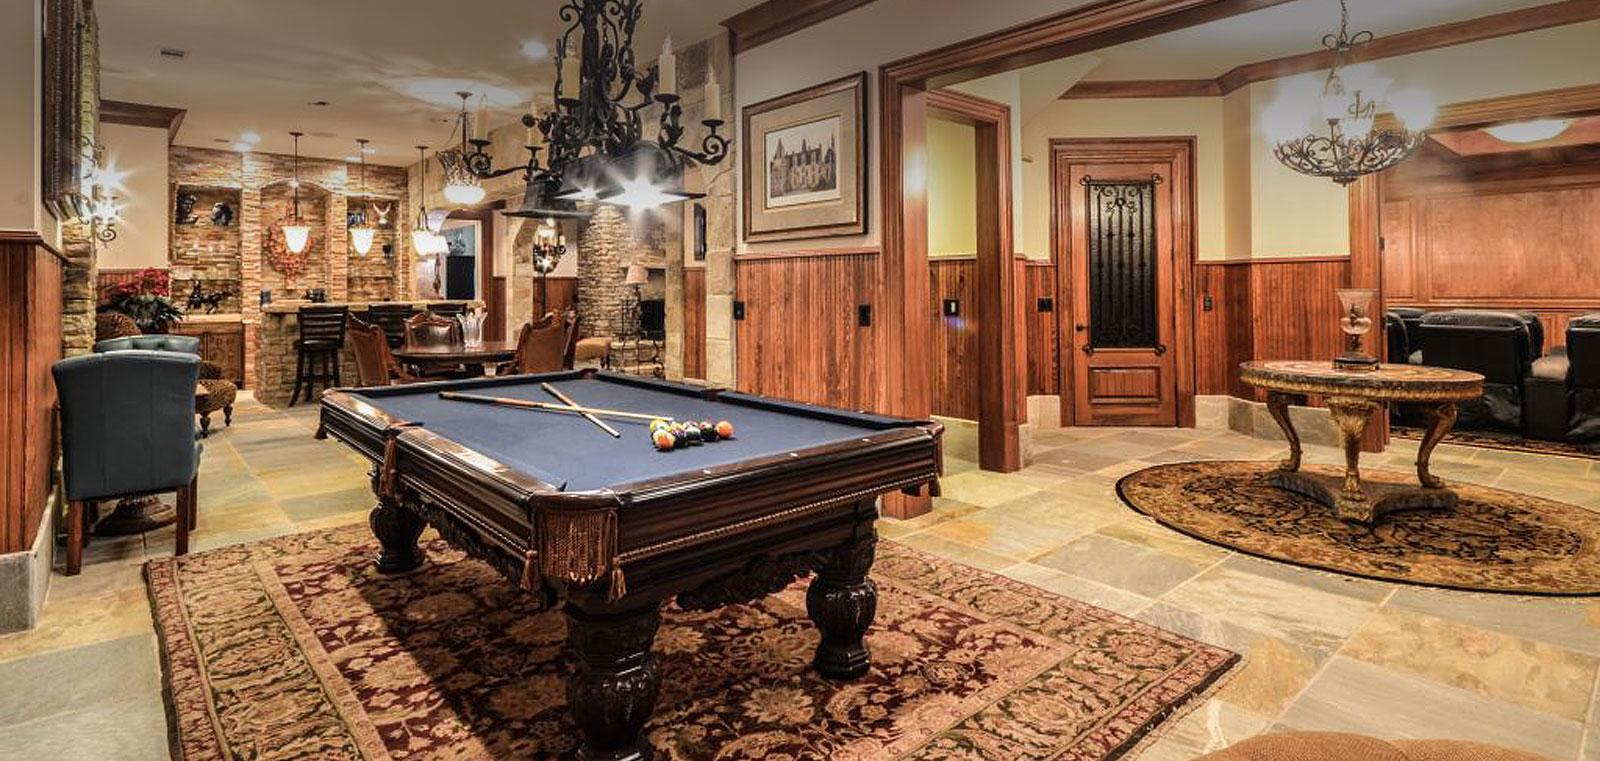 Billiard Hall - Wagner Realty Team